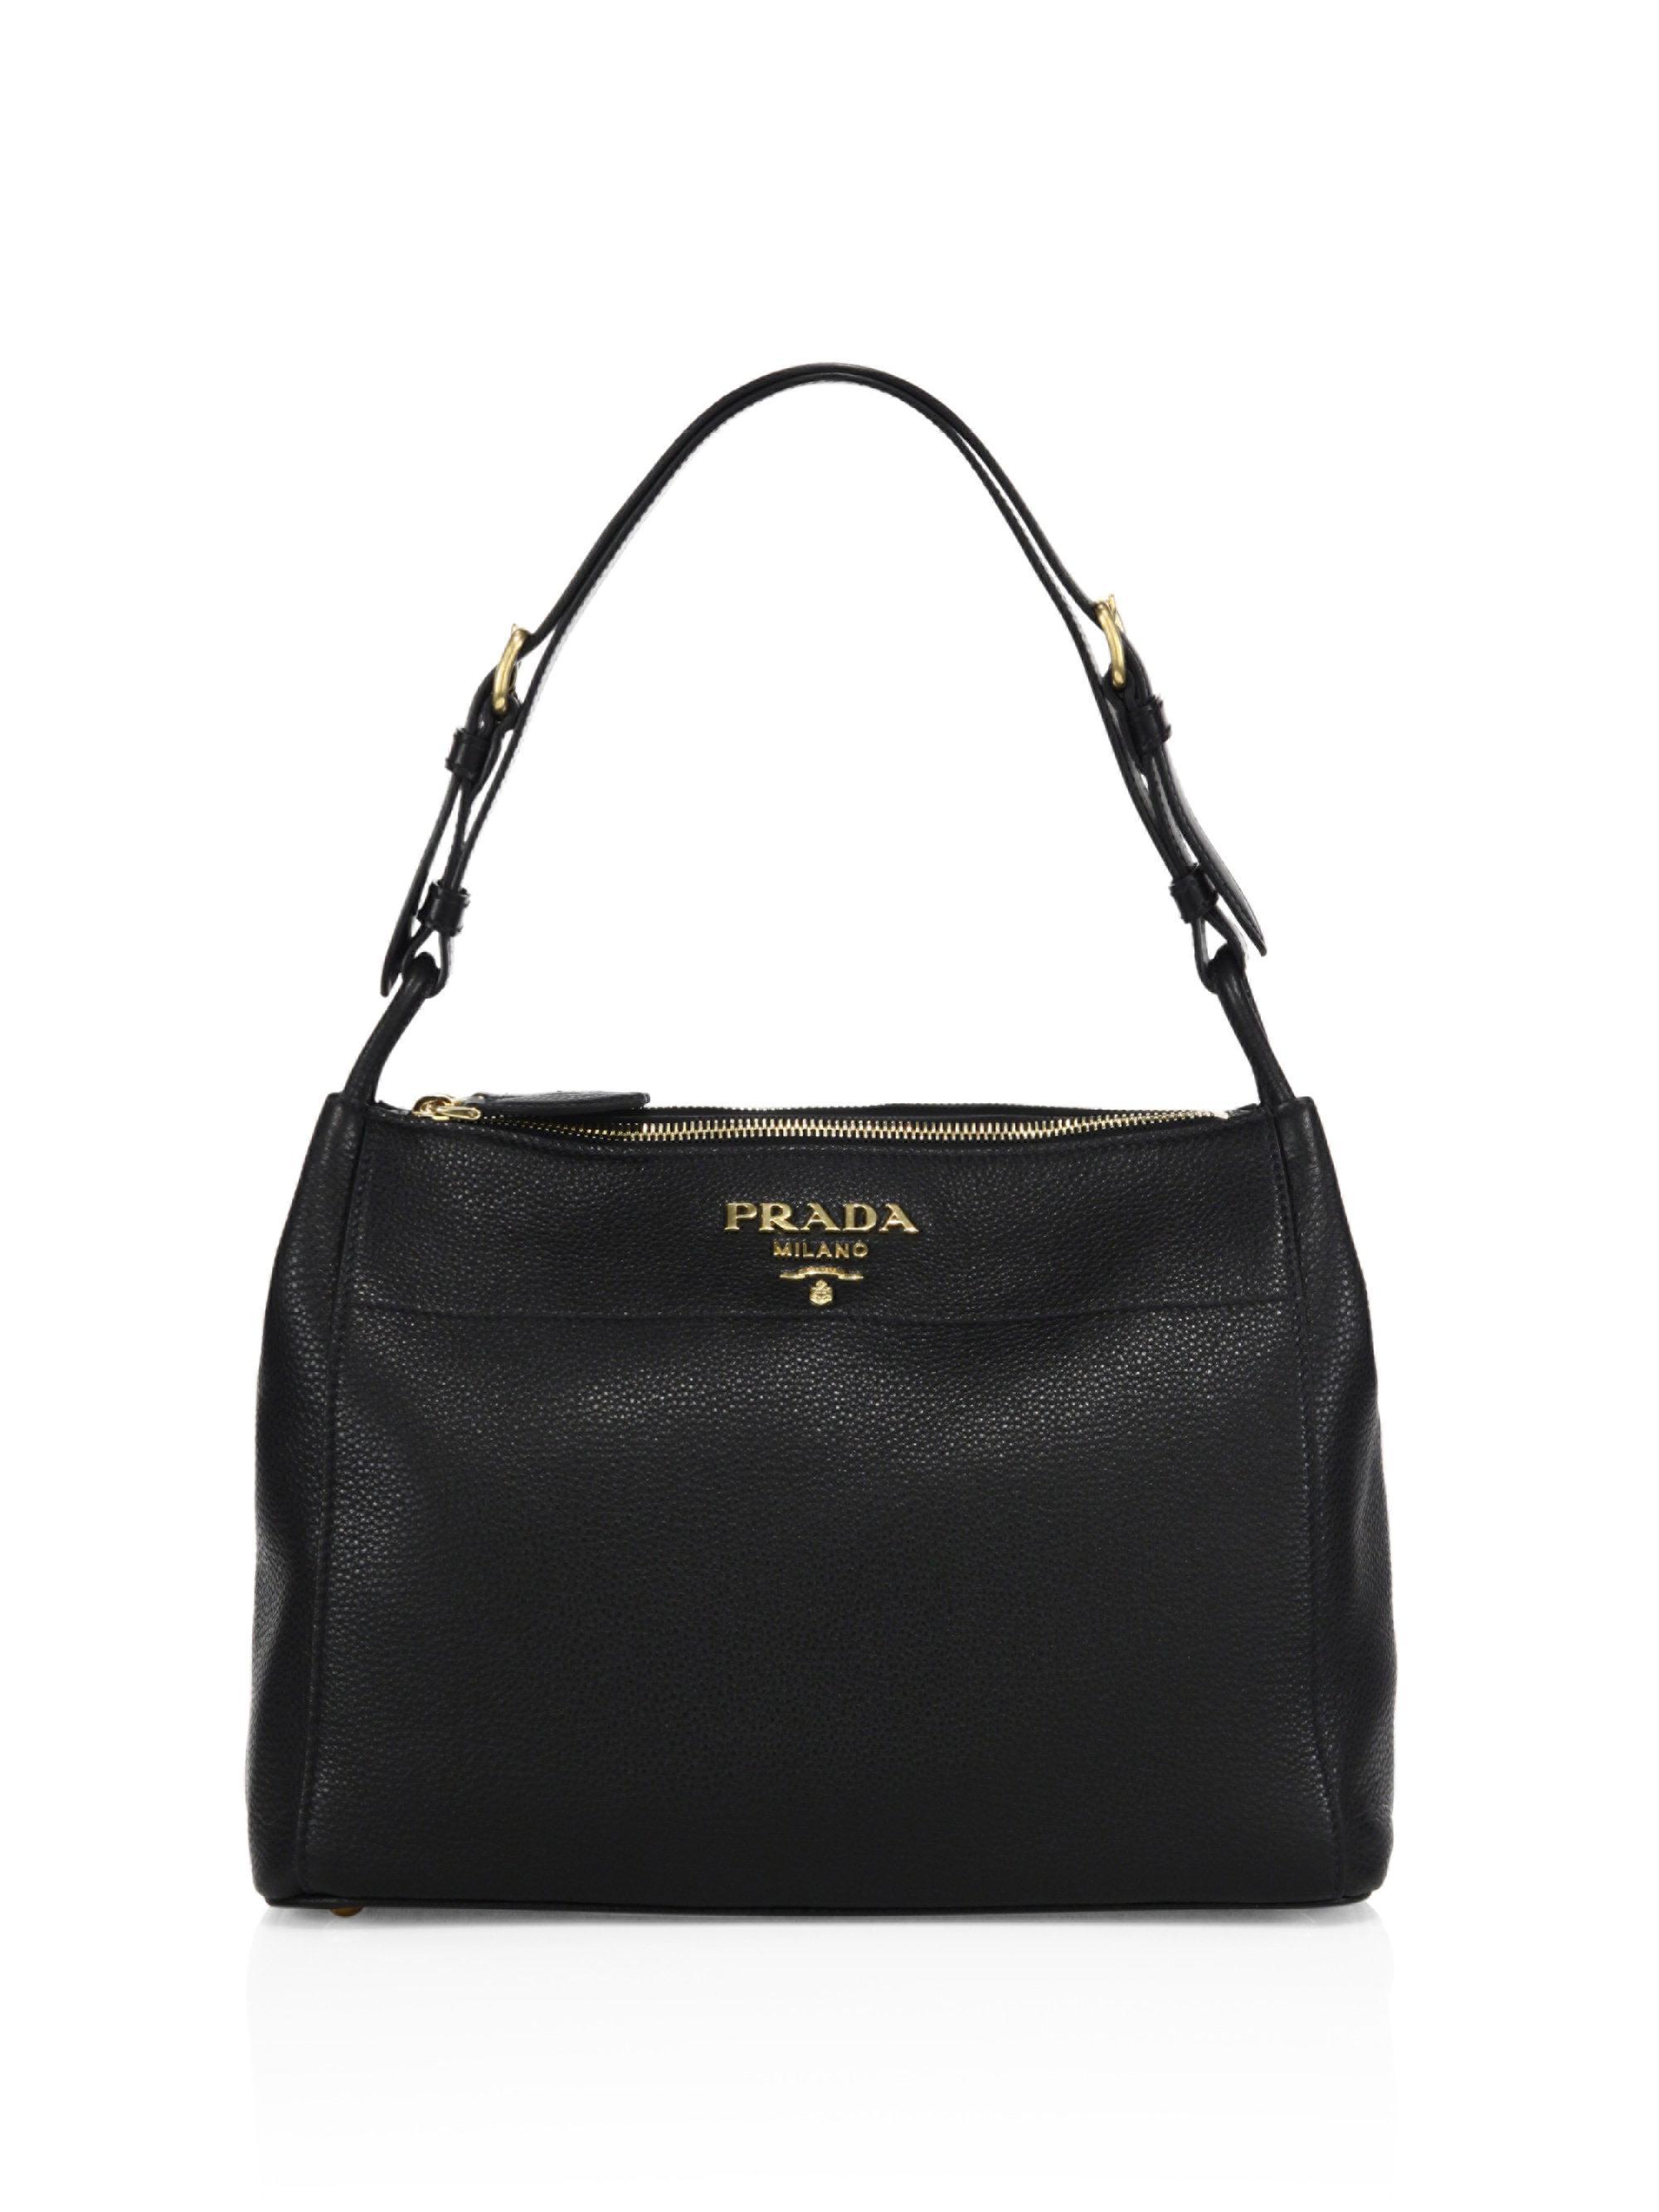 986c21e0aeb9 Lyst - Prada Pebble Leather Shoulder Bag in Black